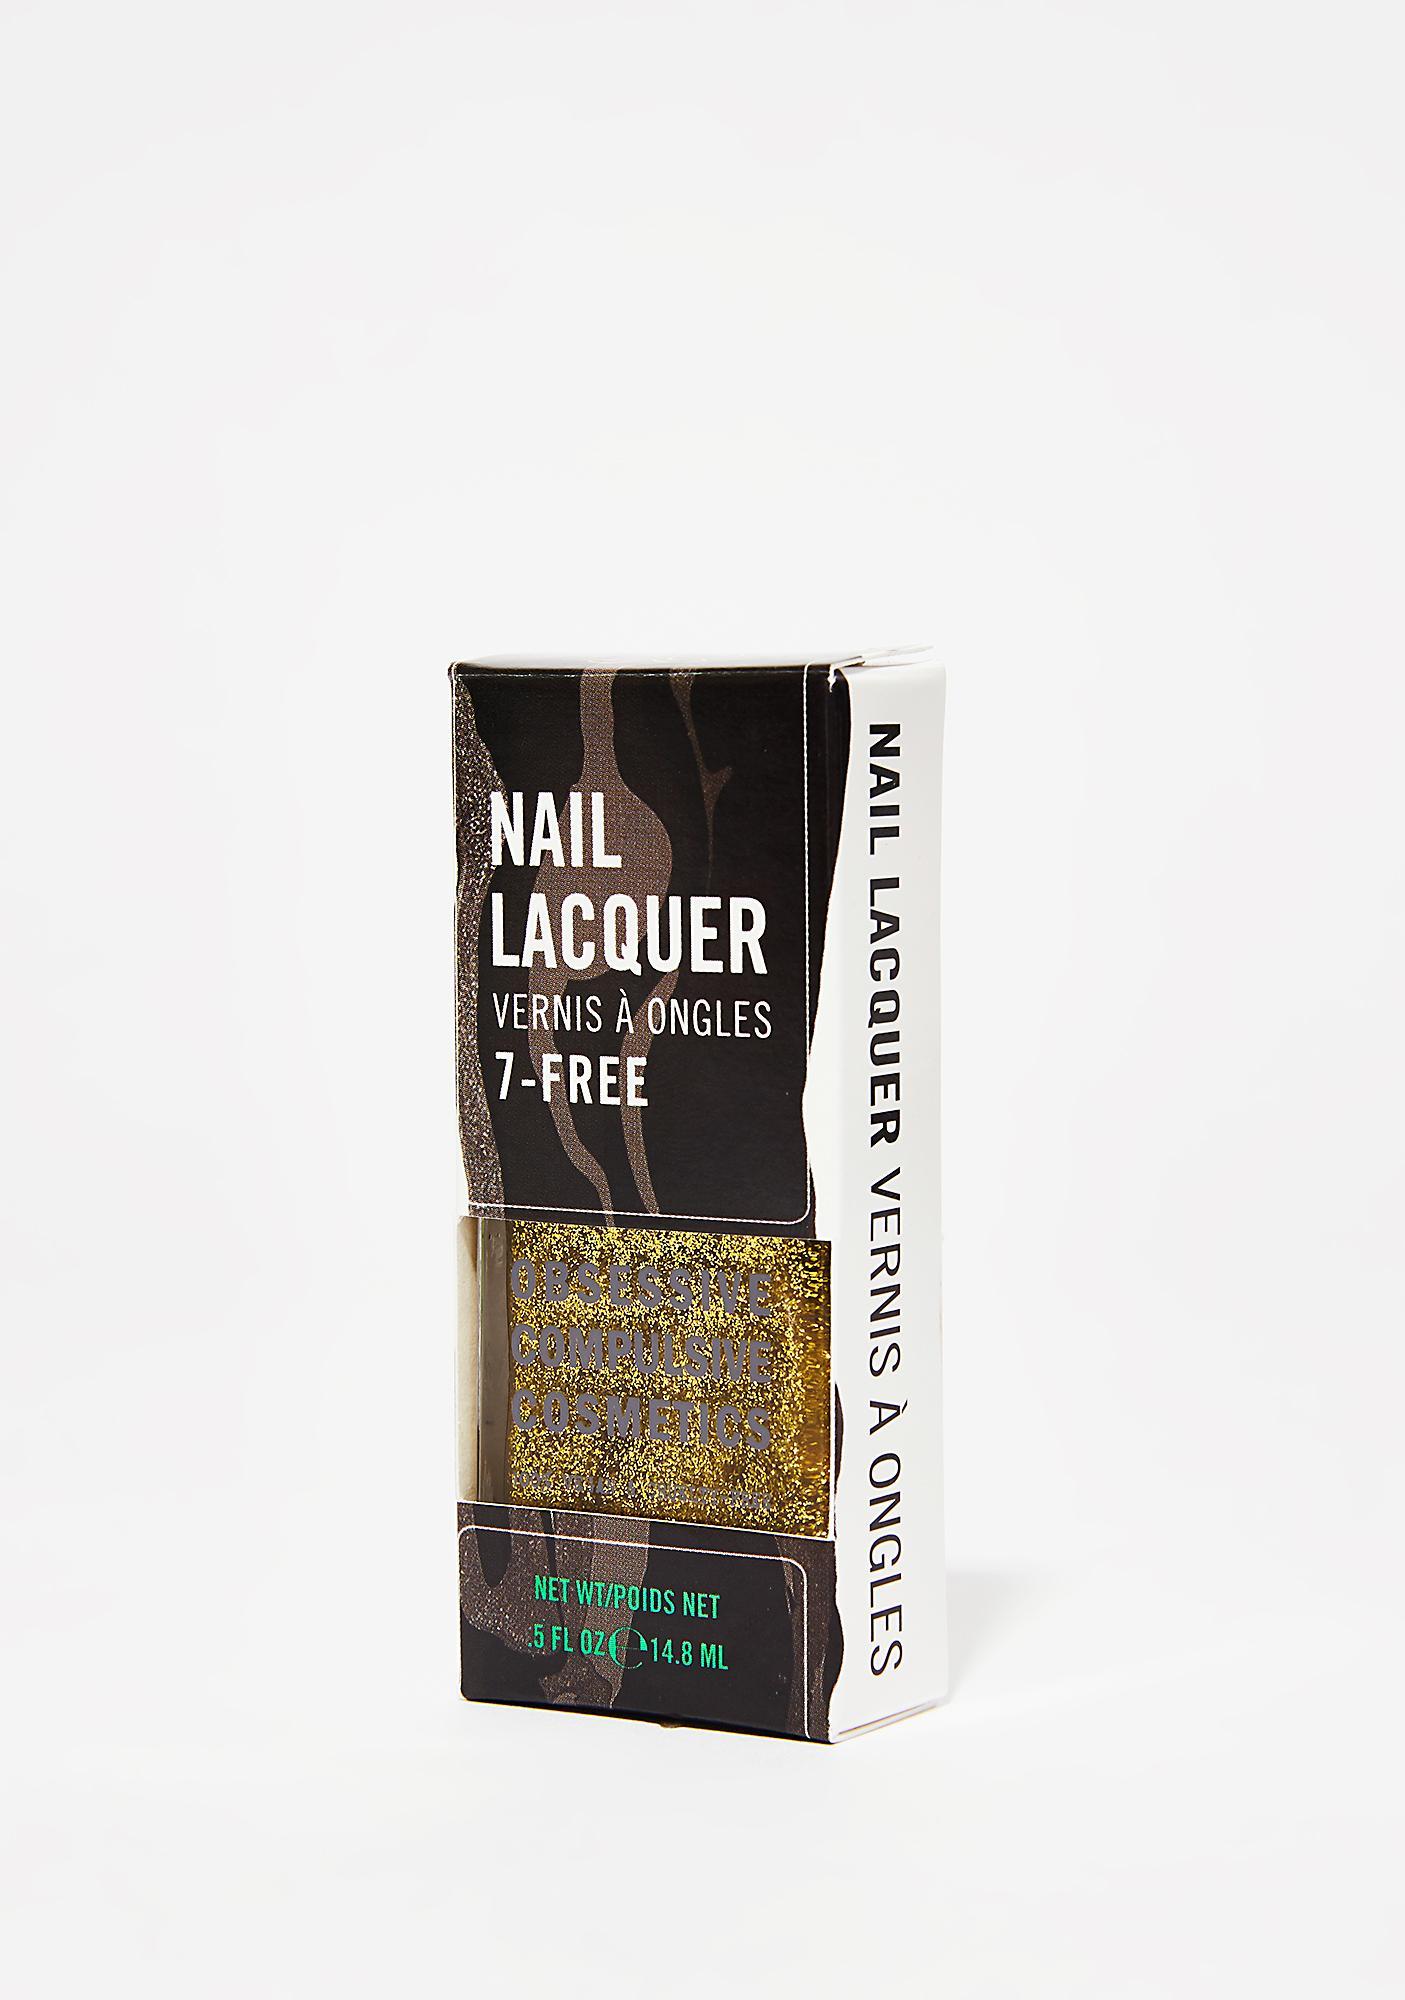 Obsessive Compulsive Cosmetics Slay Belles Nail Lacquer